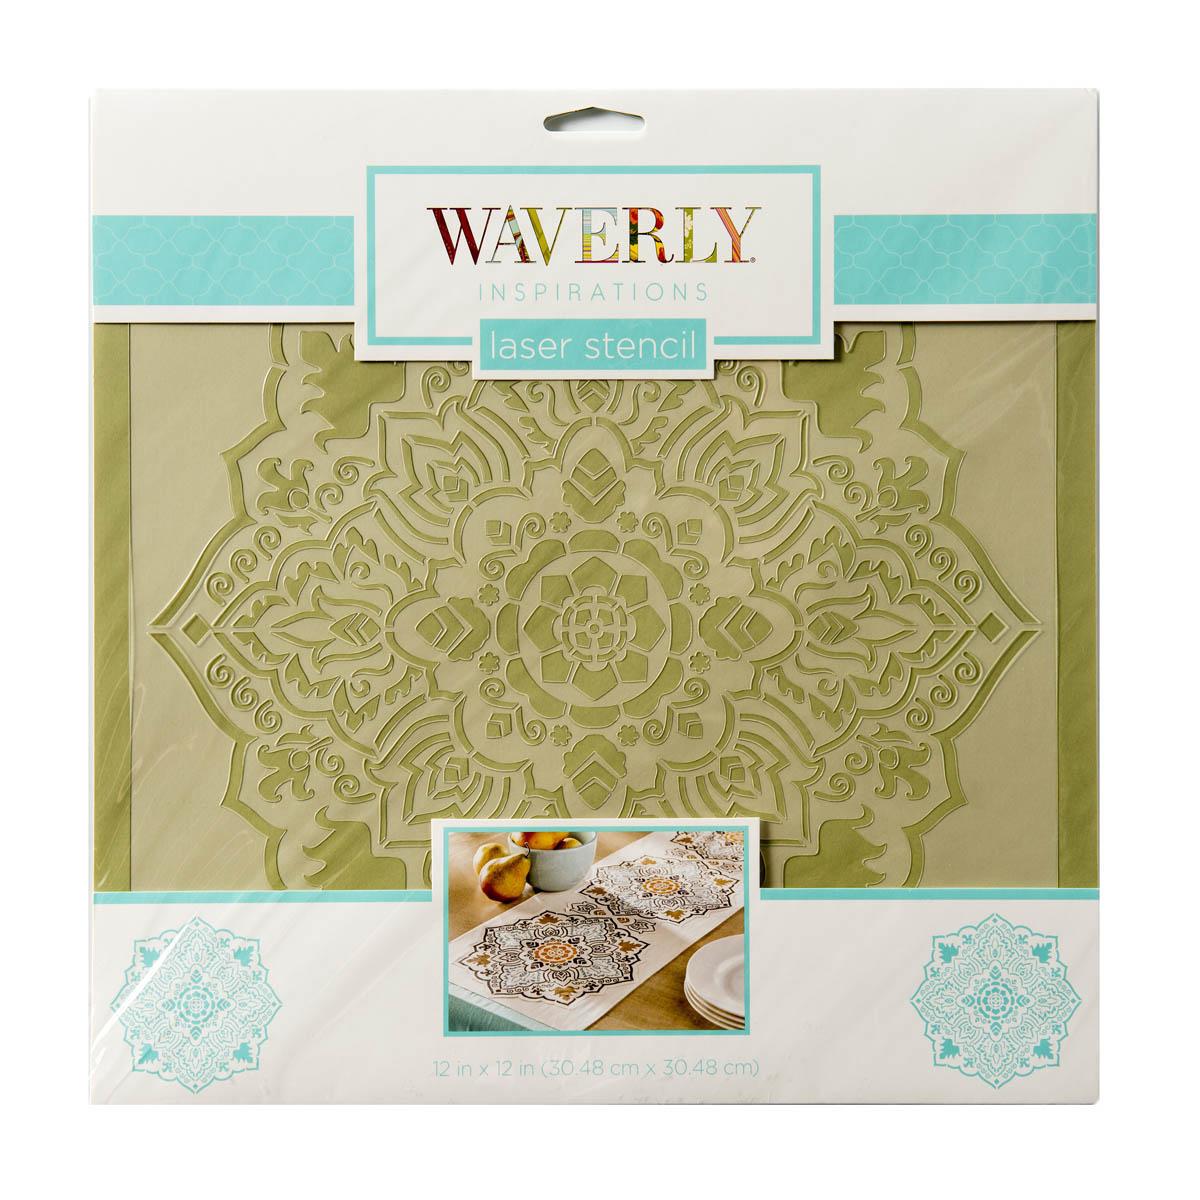 Waverly ® Inspirations Laser Stencils - Décor - Tile, 12